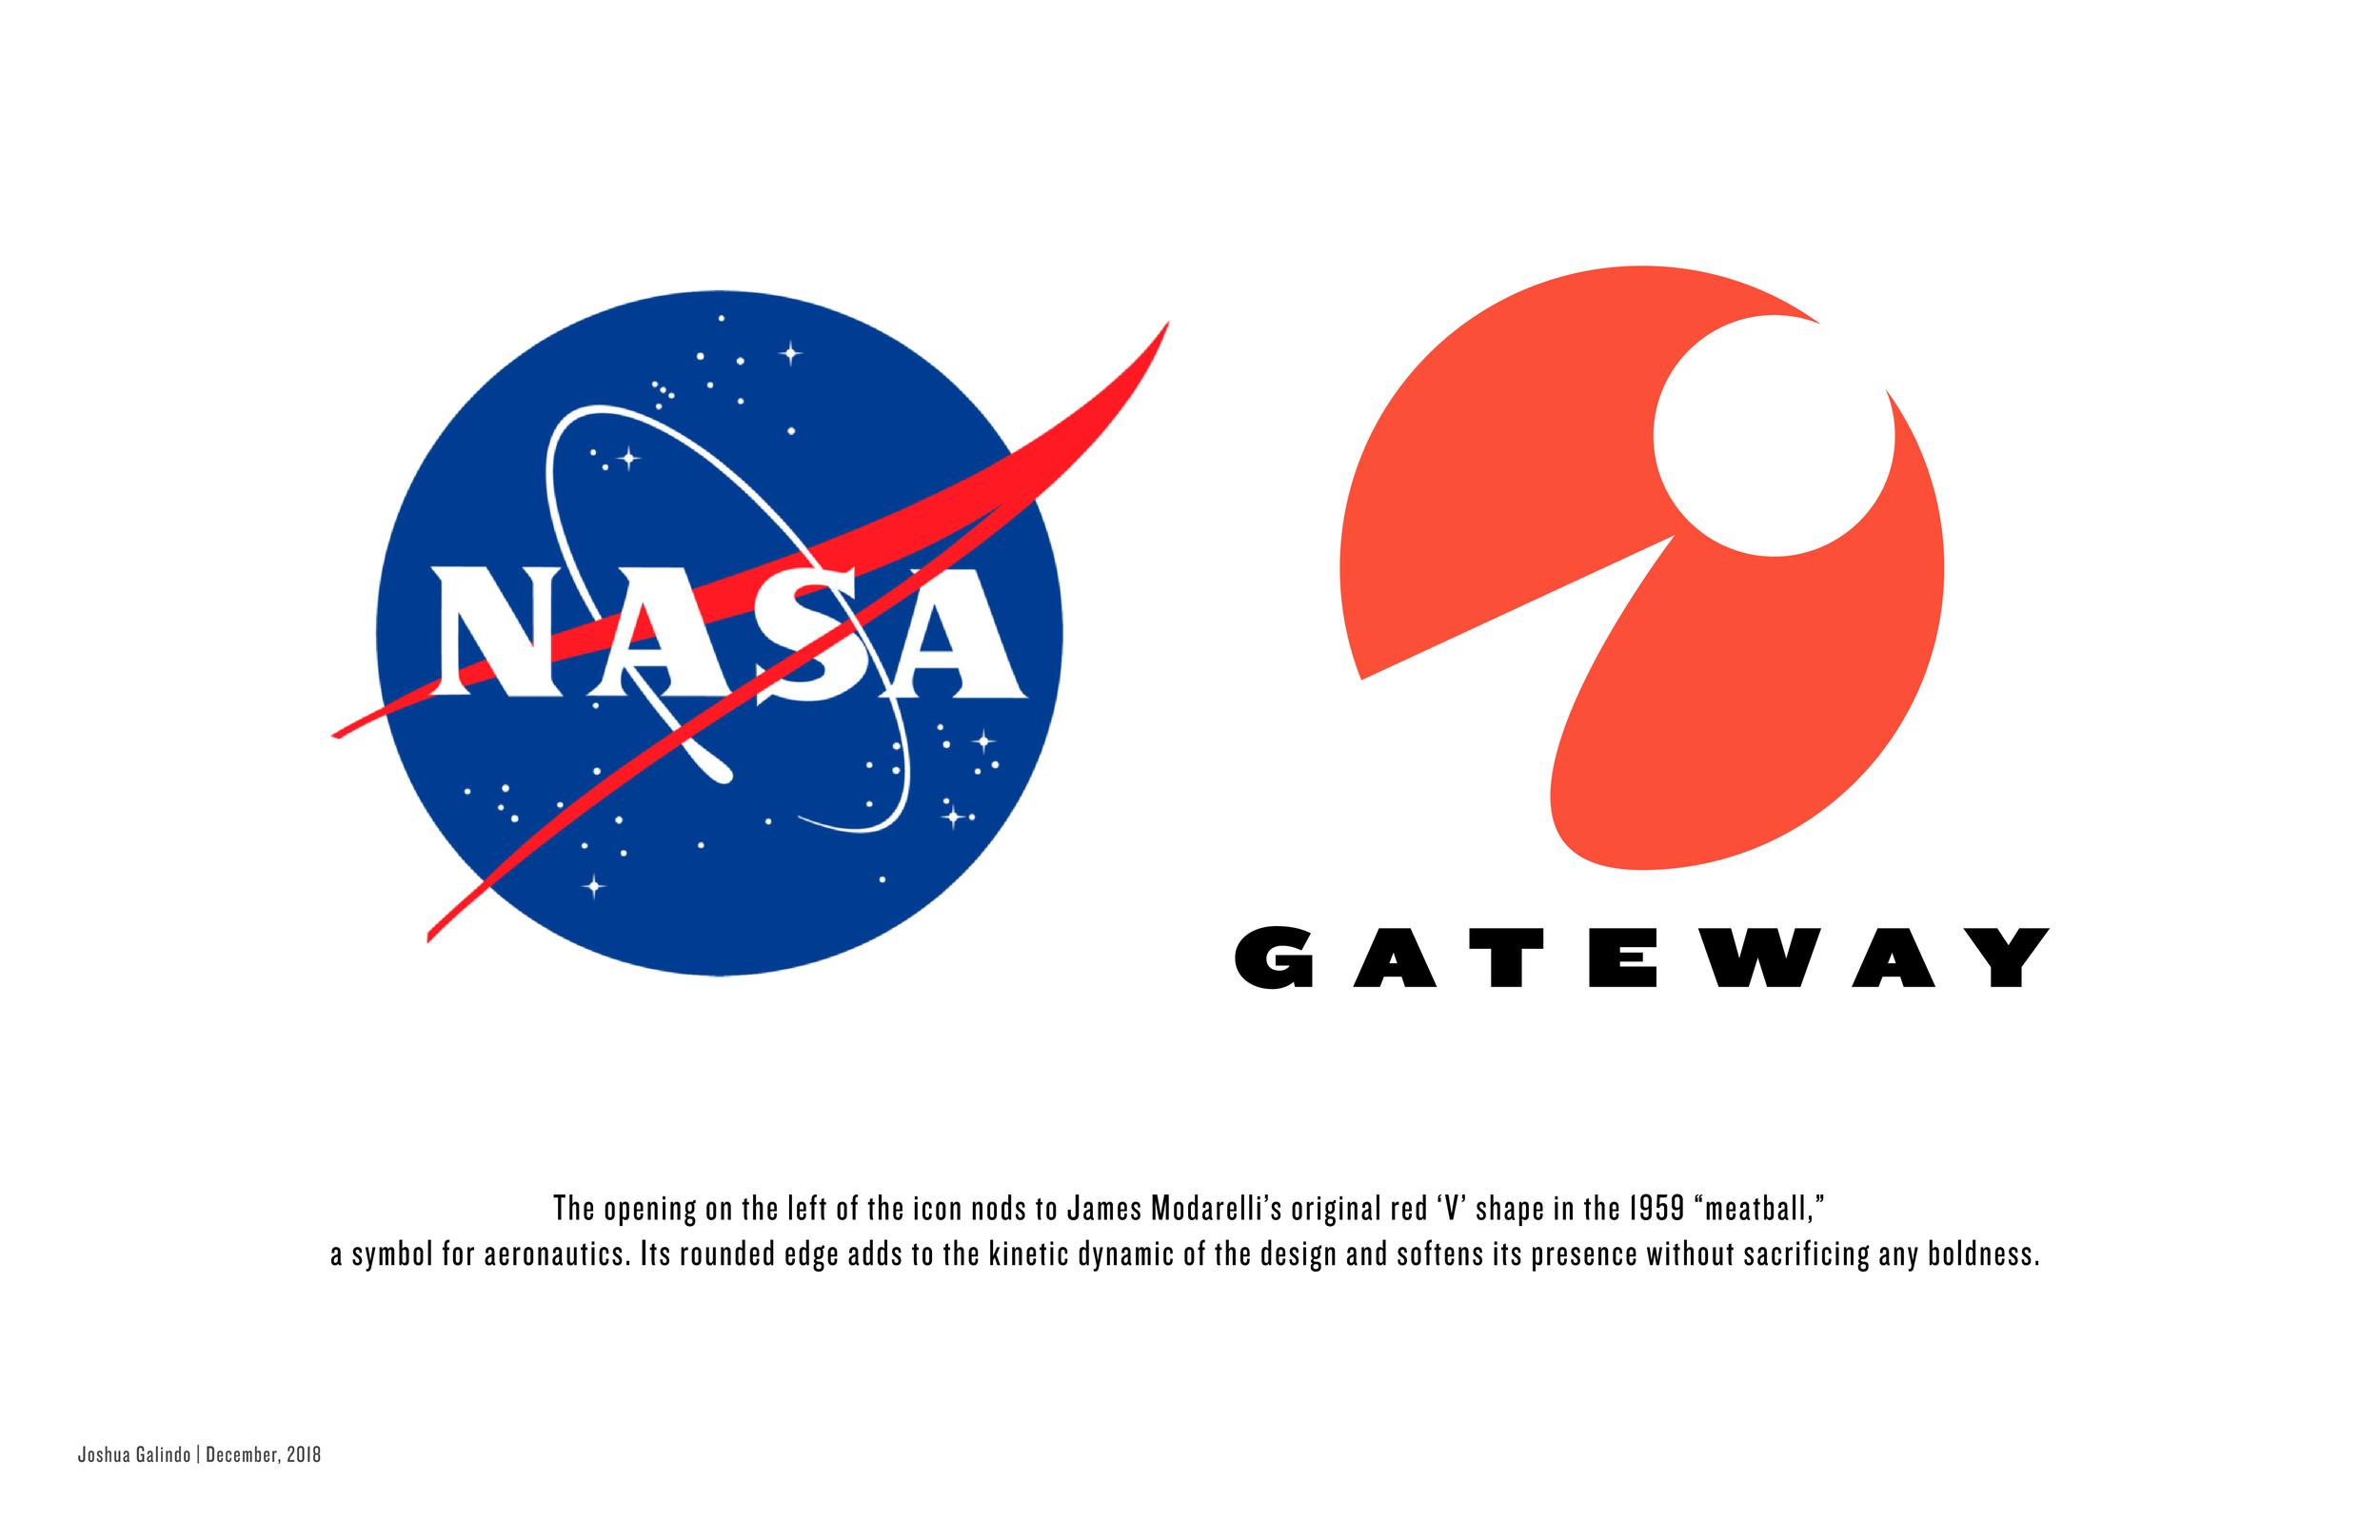 GatewayLogo_Info__JoshuaGalindo_01-09.png